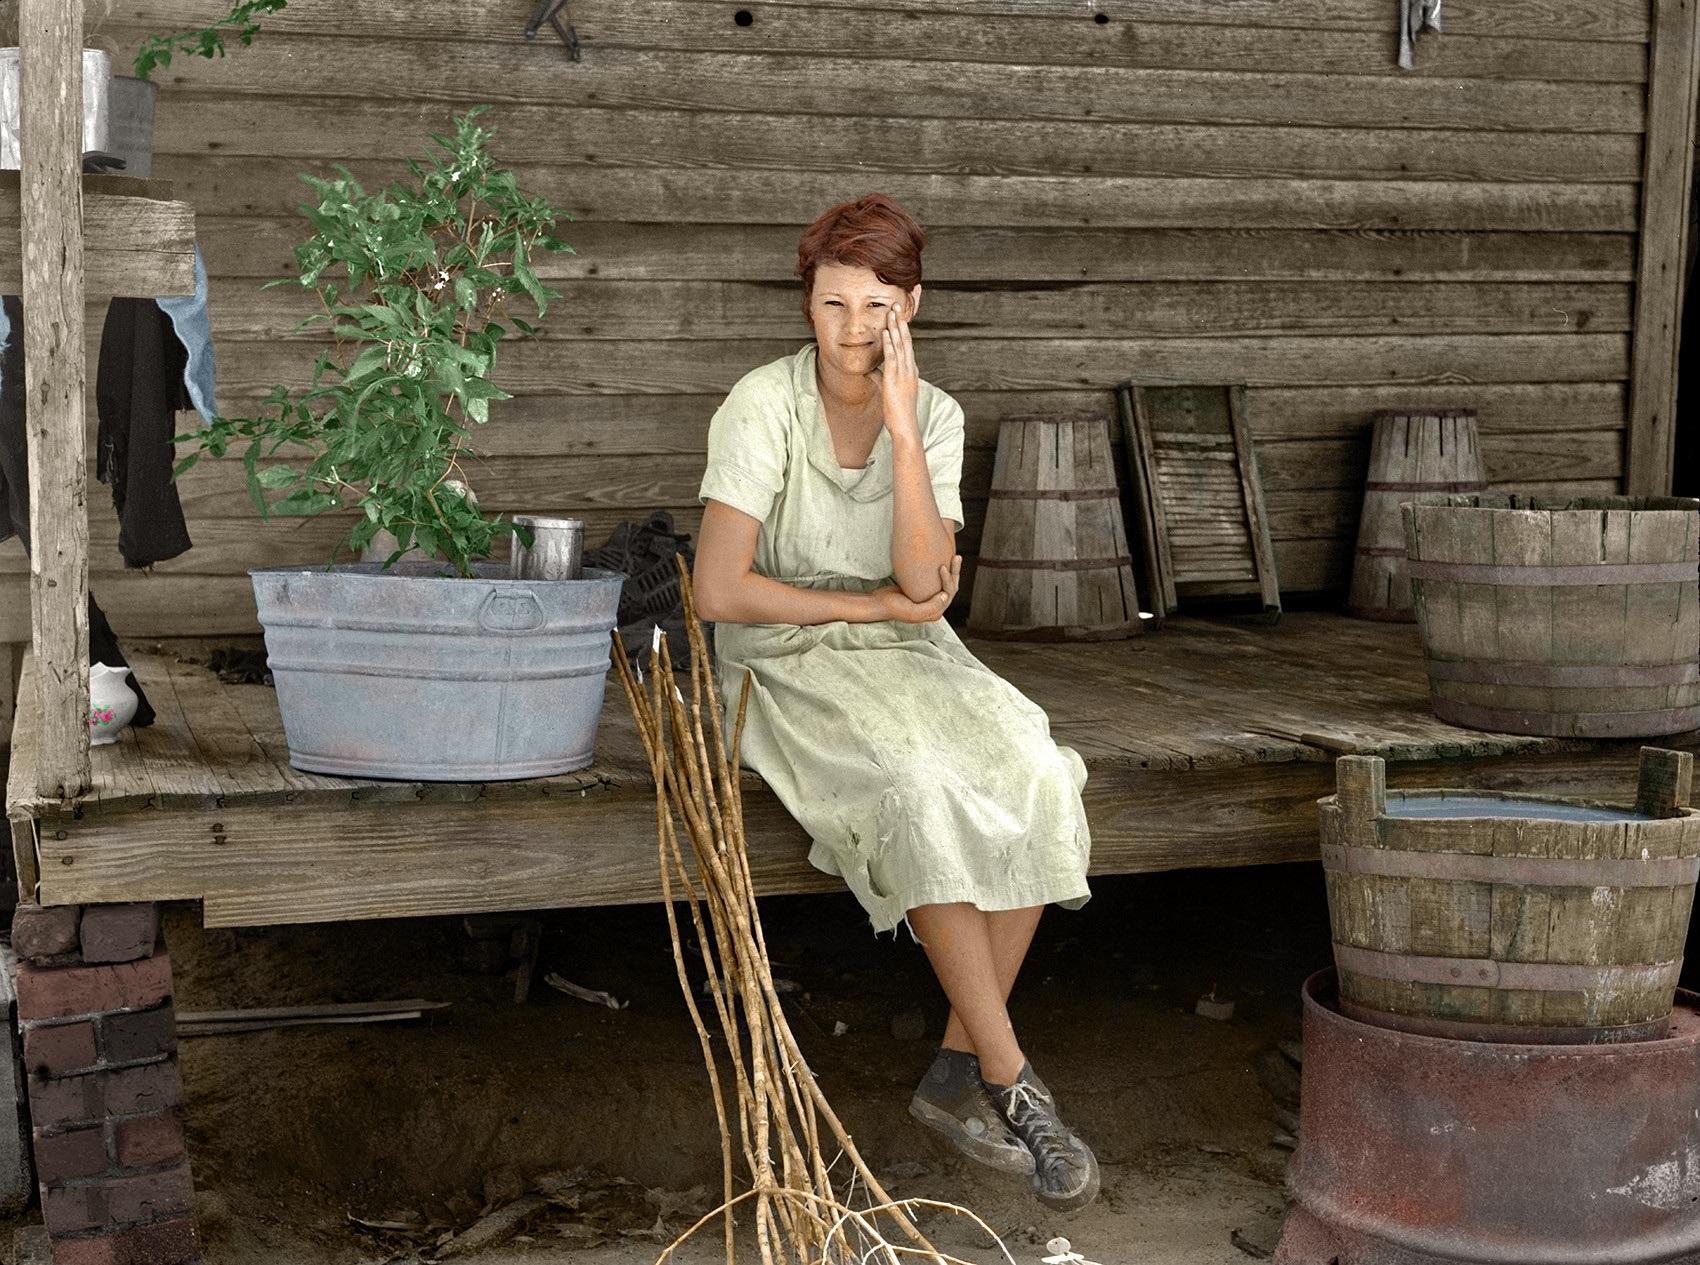 1935Daughter_of_a_Resettled_Farmer_1935_Colorized.jpg